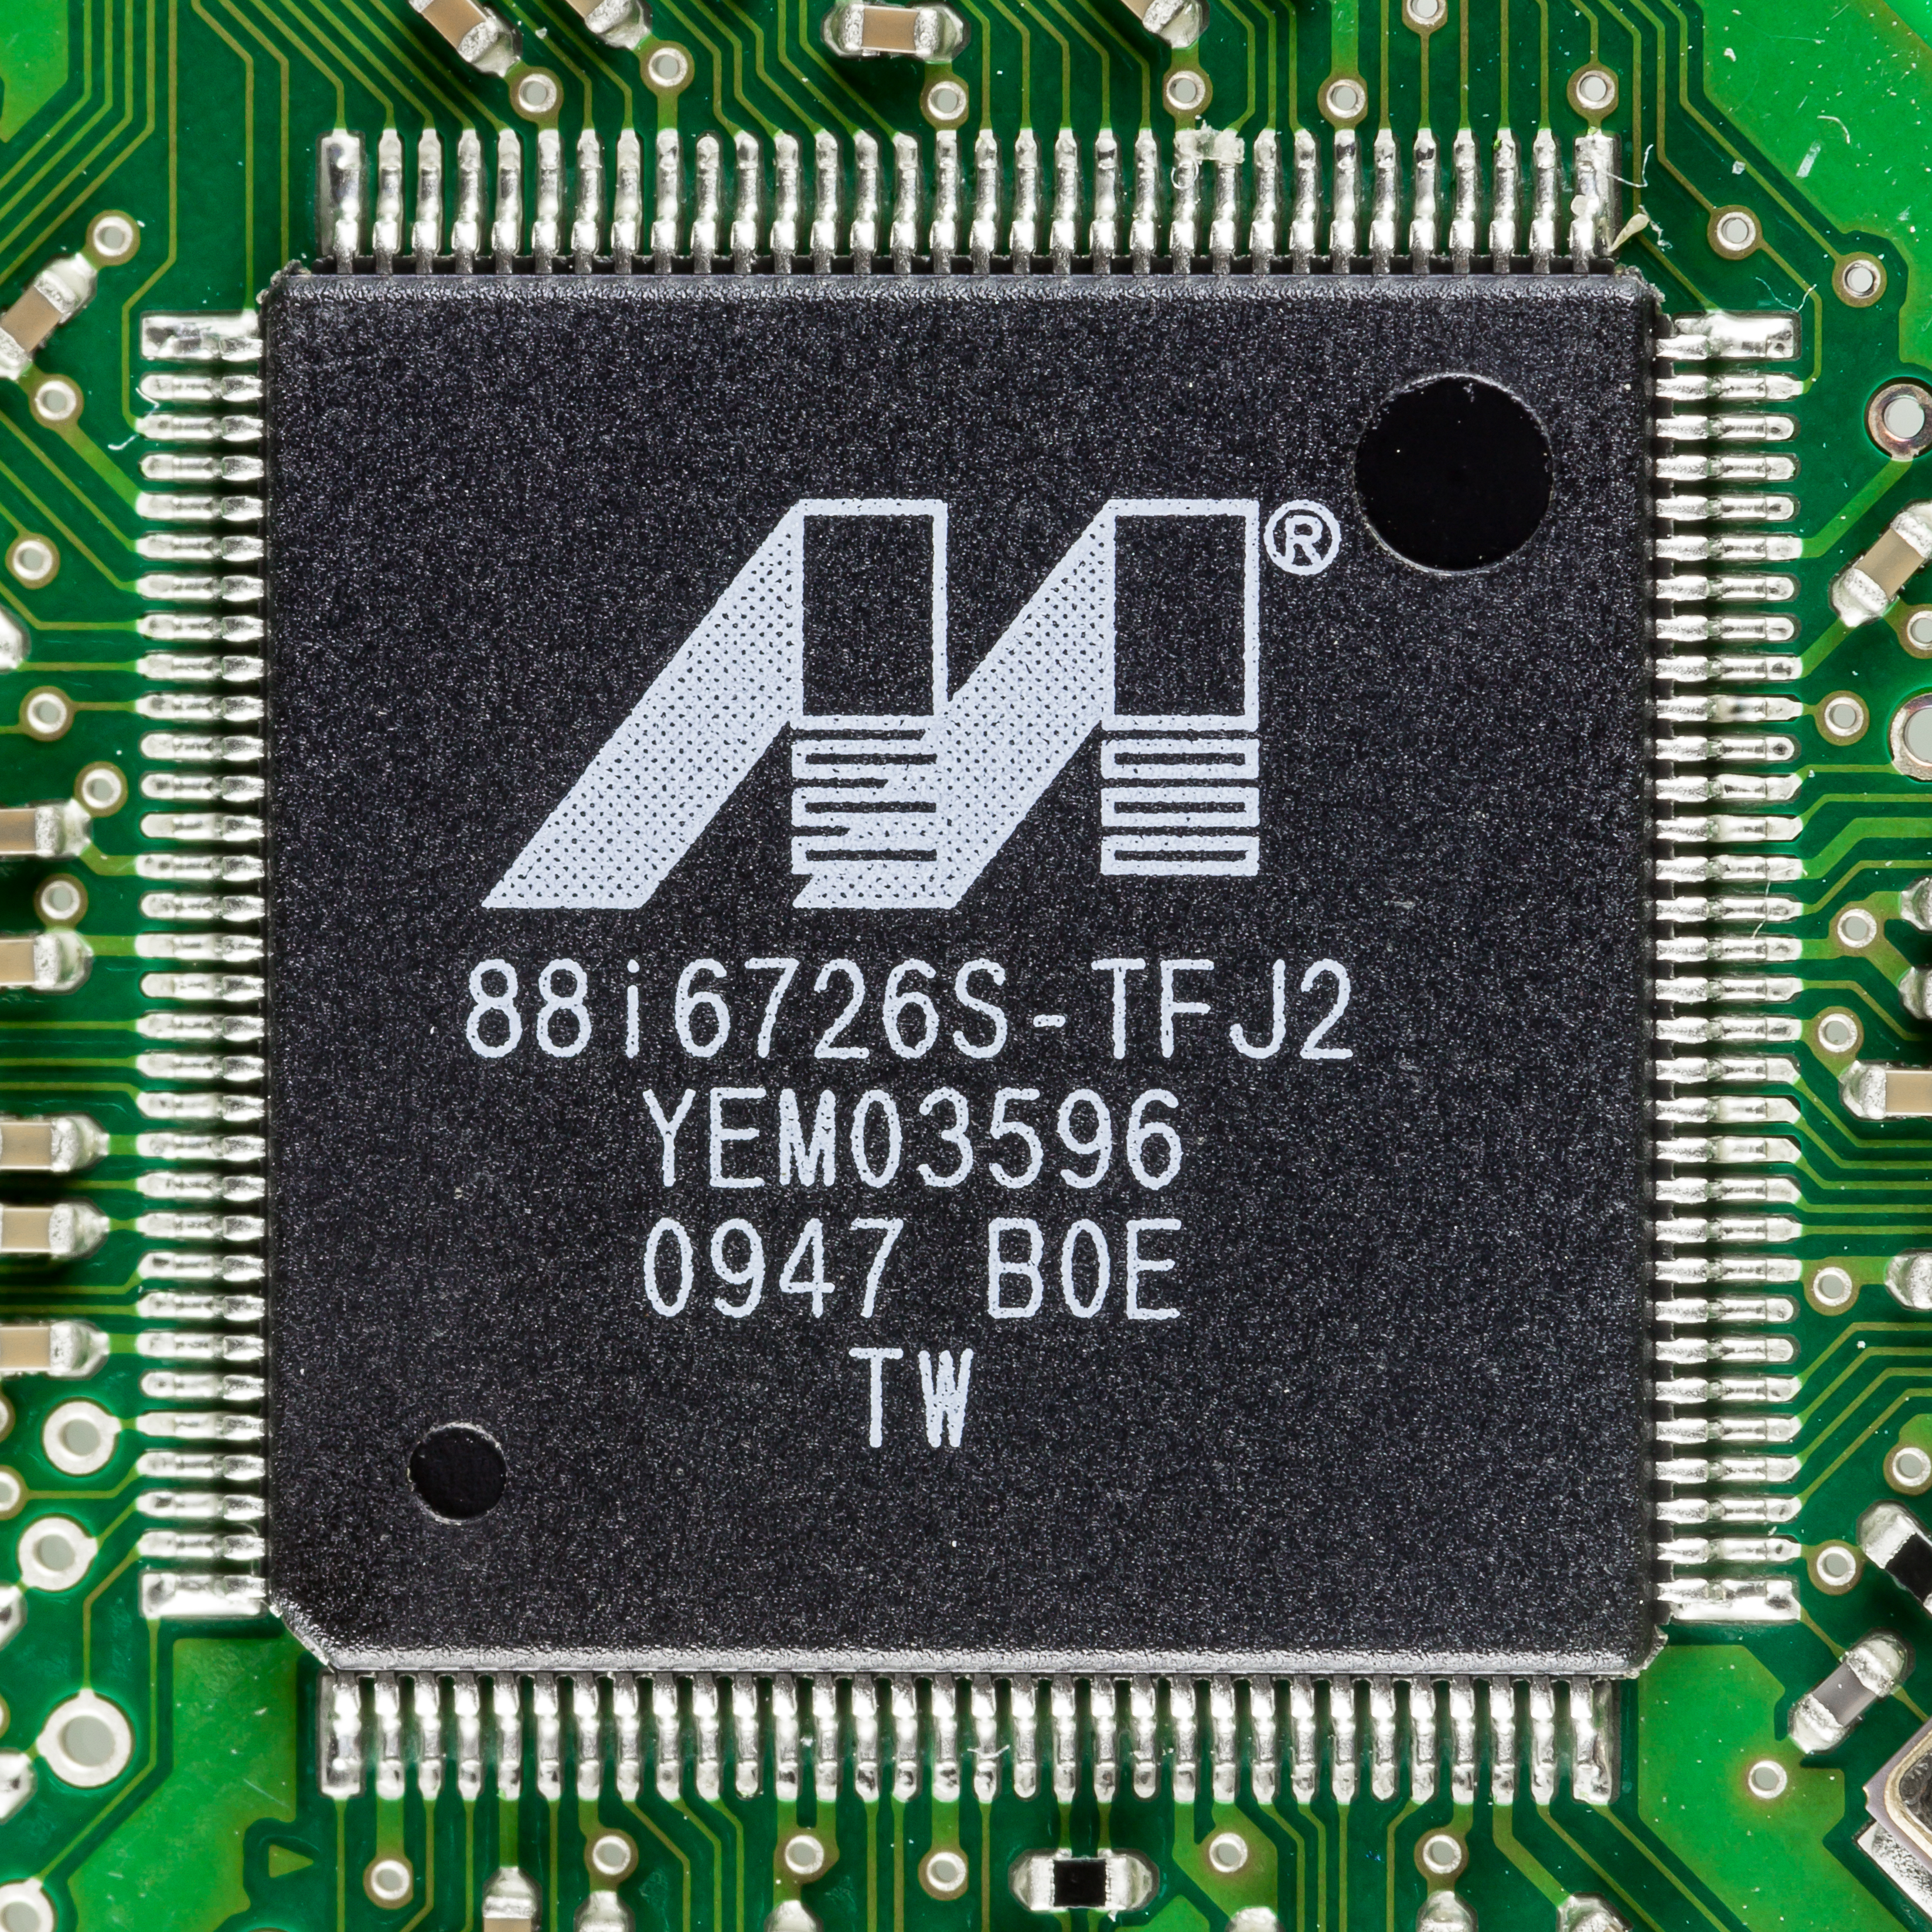 Samsung hm160hc firmware lq100-10 pcb board number bf41-00180a | ebay.